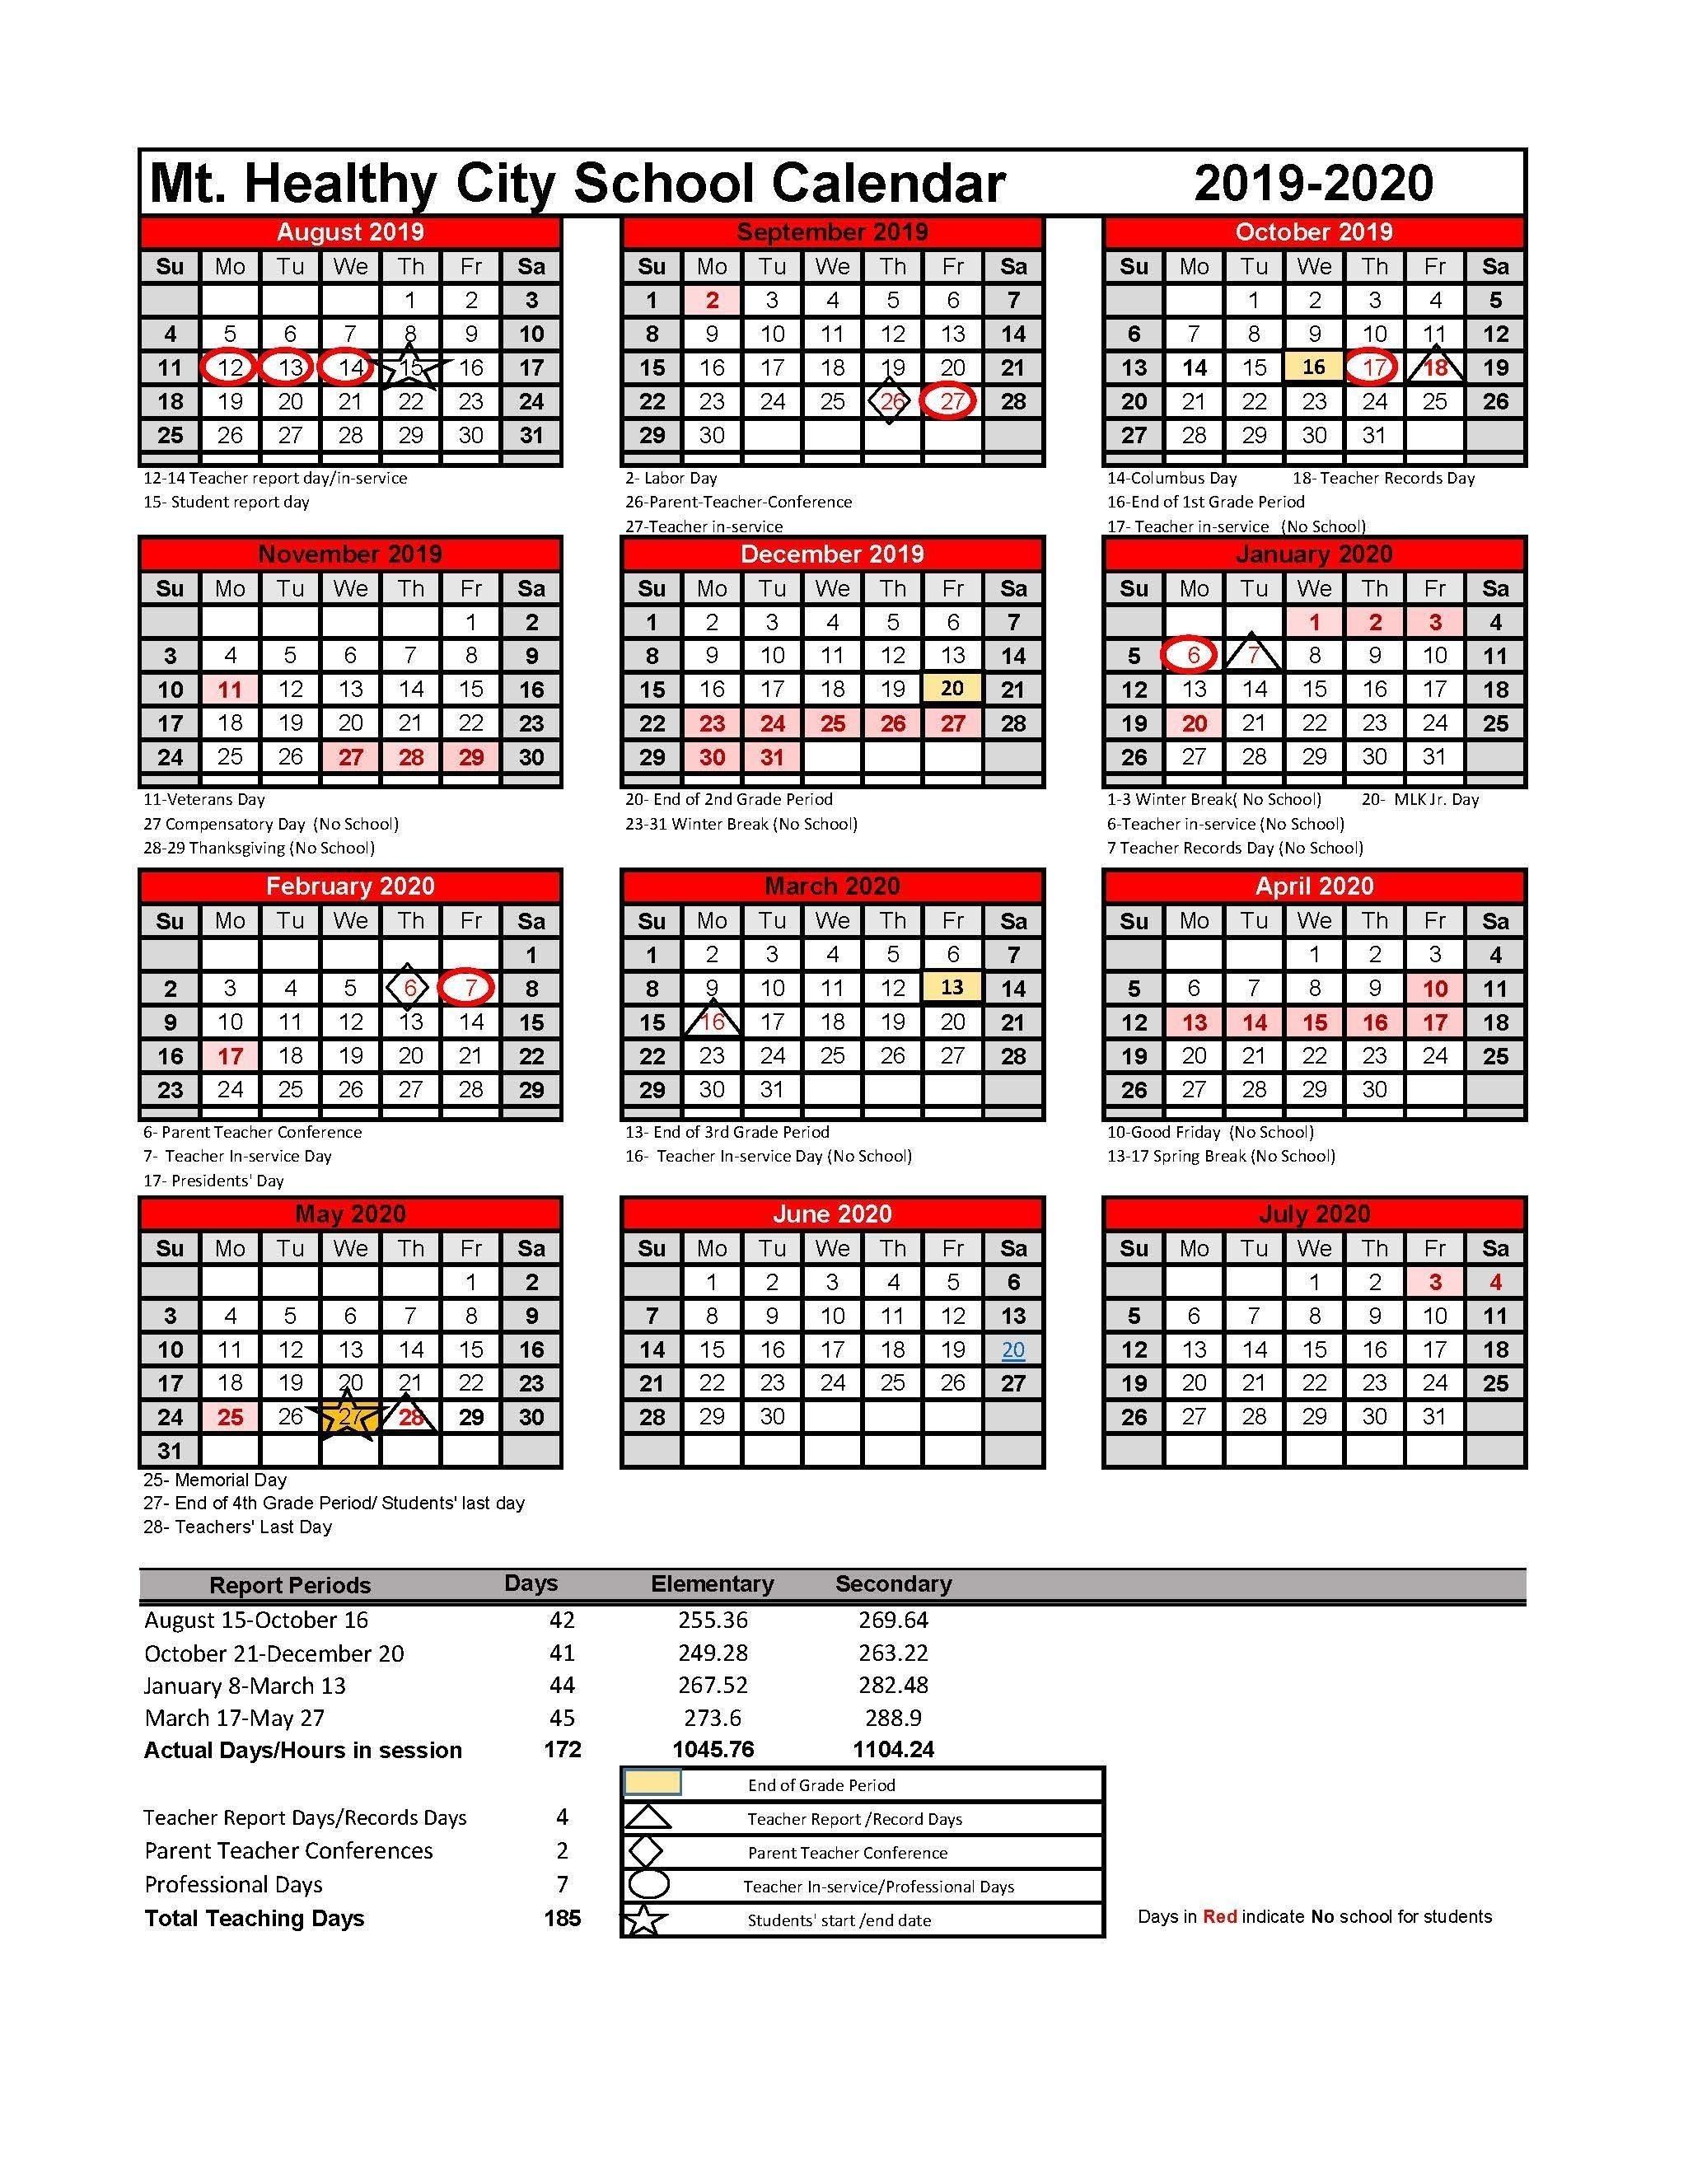 2019-2020 District Calendar – 2019-2020 District Calendar – Mt_District 6 School Calendar 2020